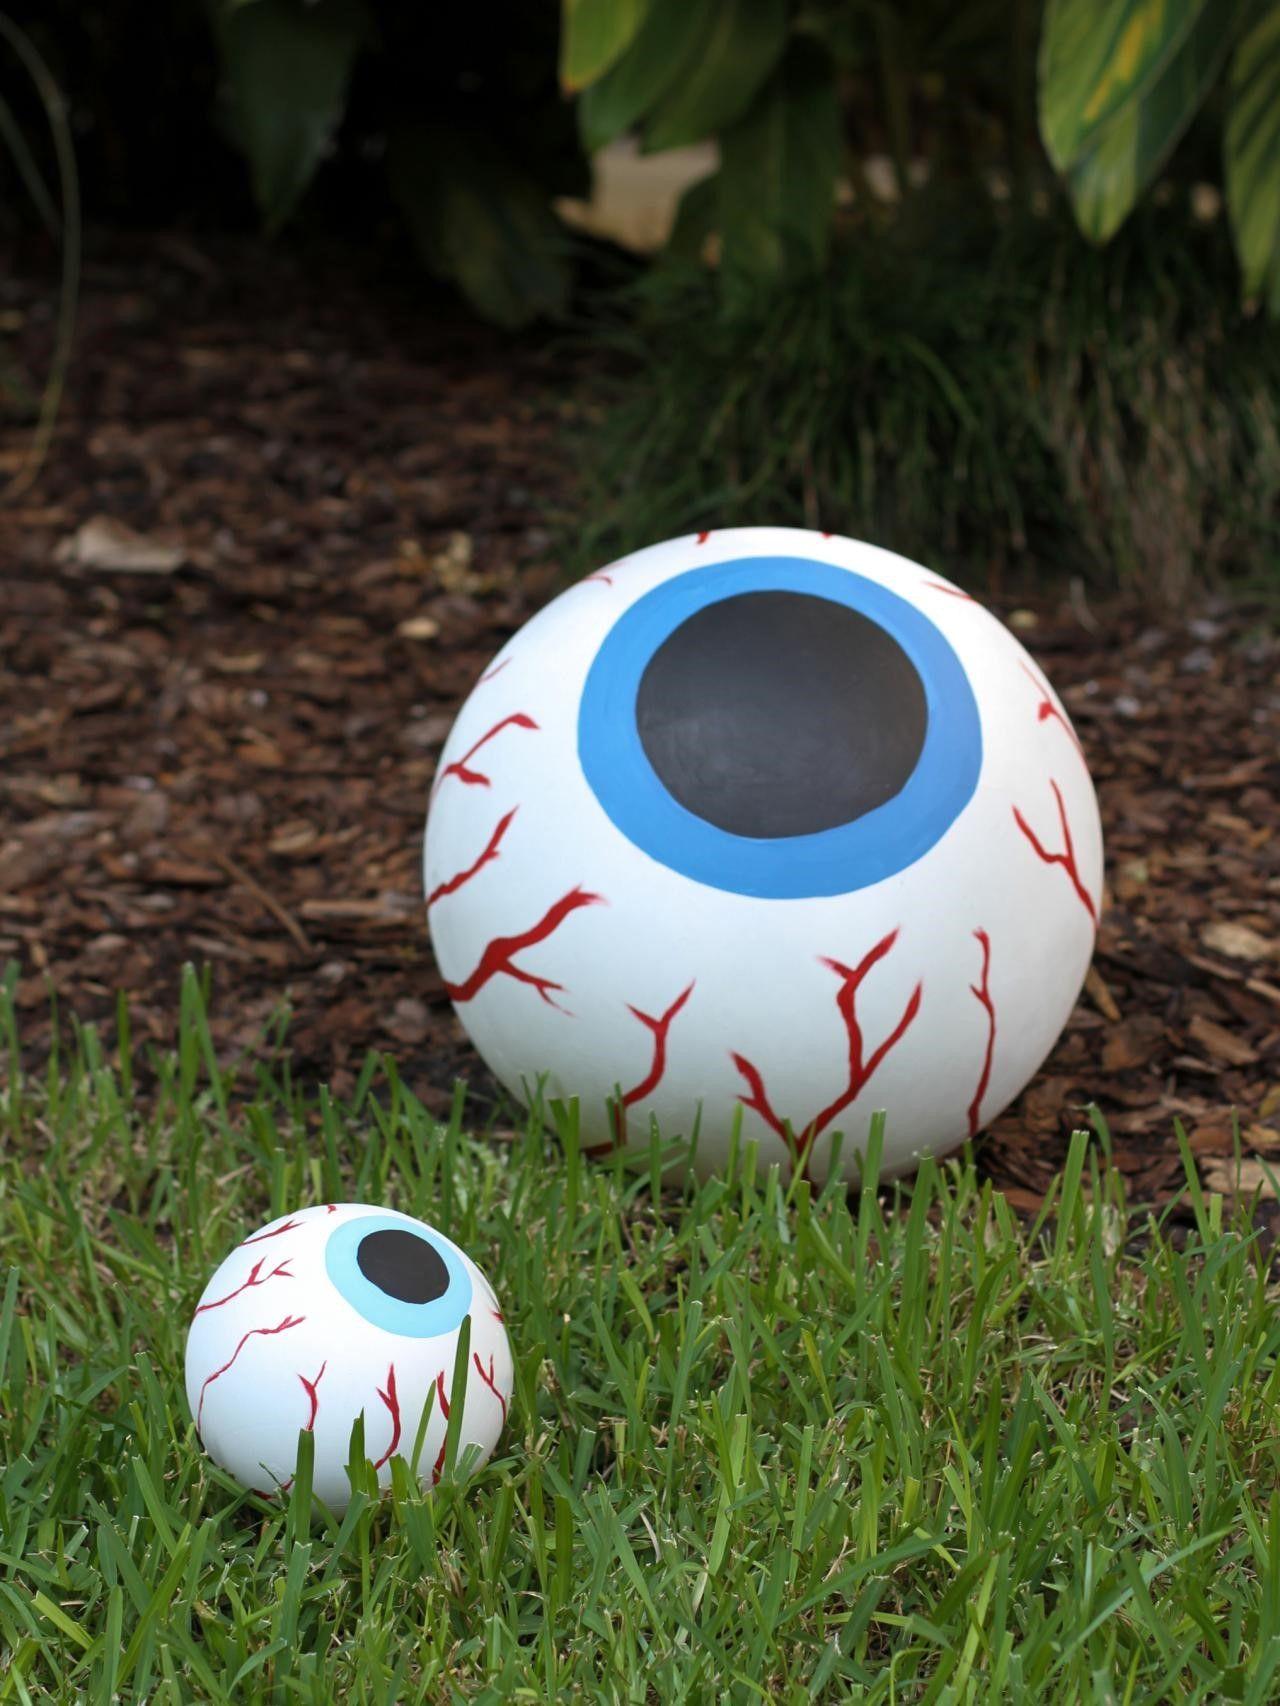 35+ Homemade outdoor halloween decorations ideas in 2021